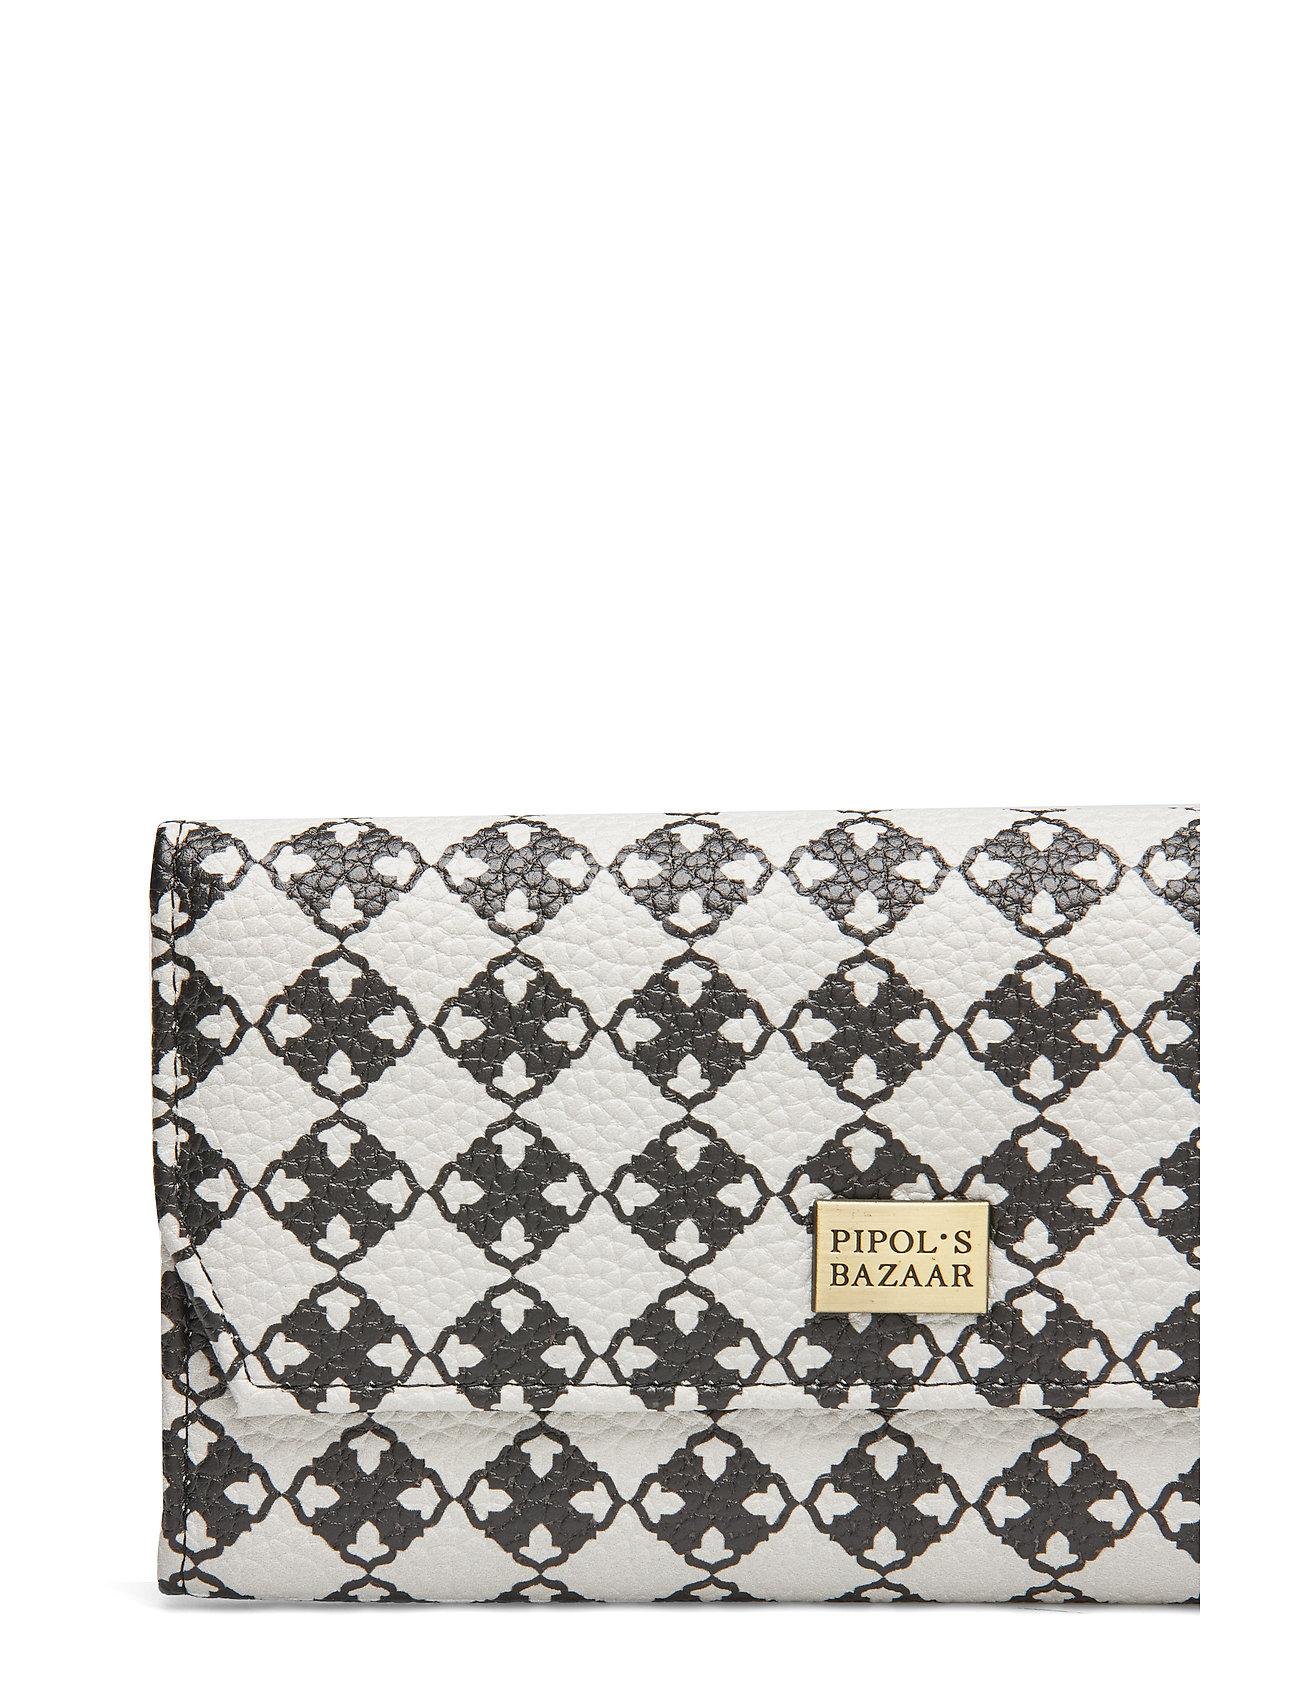 Bazaar Foldable Stile Pipols Logoblackamp; Wallet WhitePipol's PiZuXk